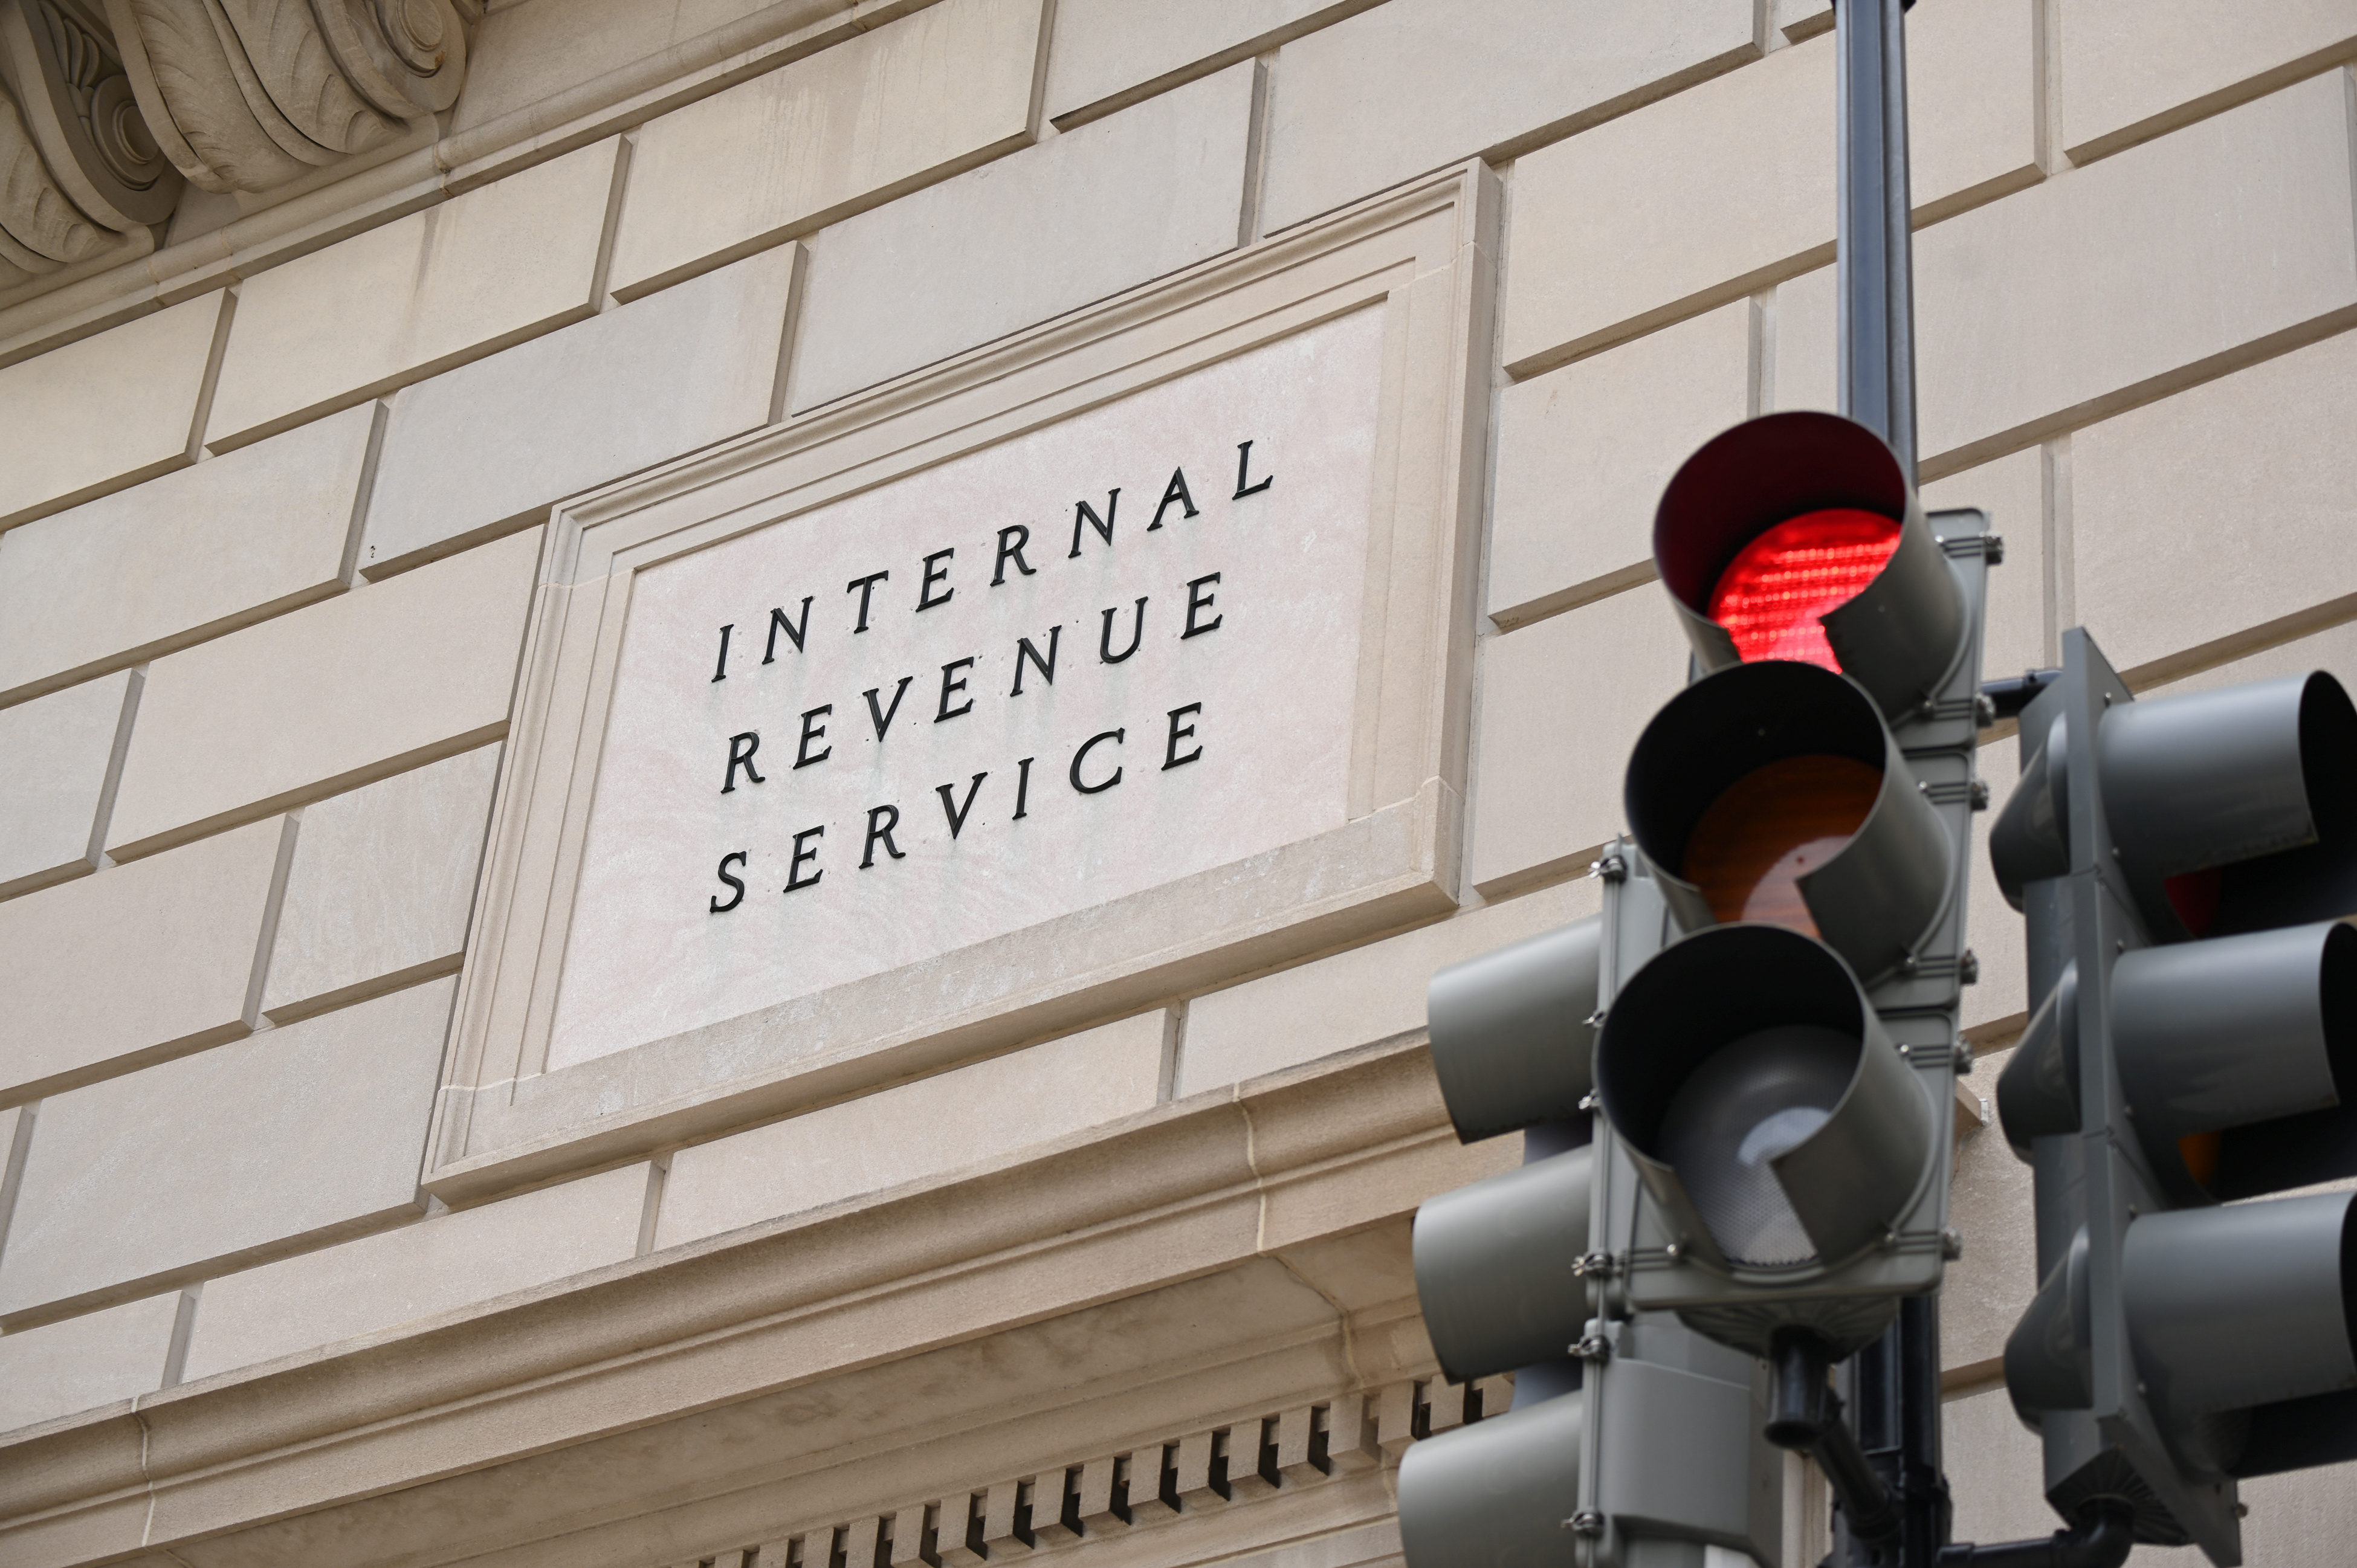 The Internal Revenue Service building is seen in Washington, U.S. September 28, 2020. REUTERS/Erin Scott